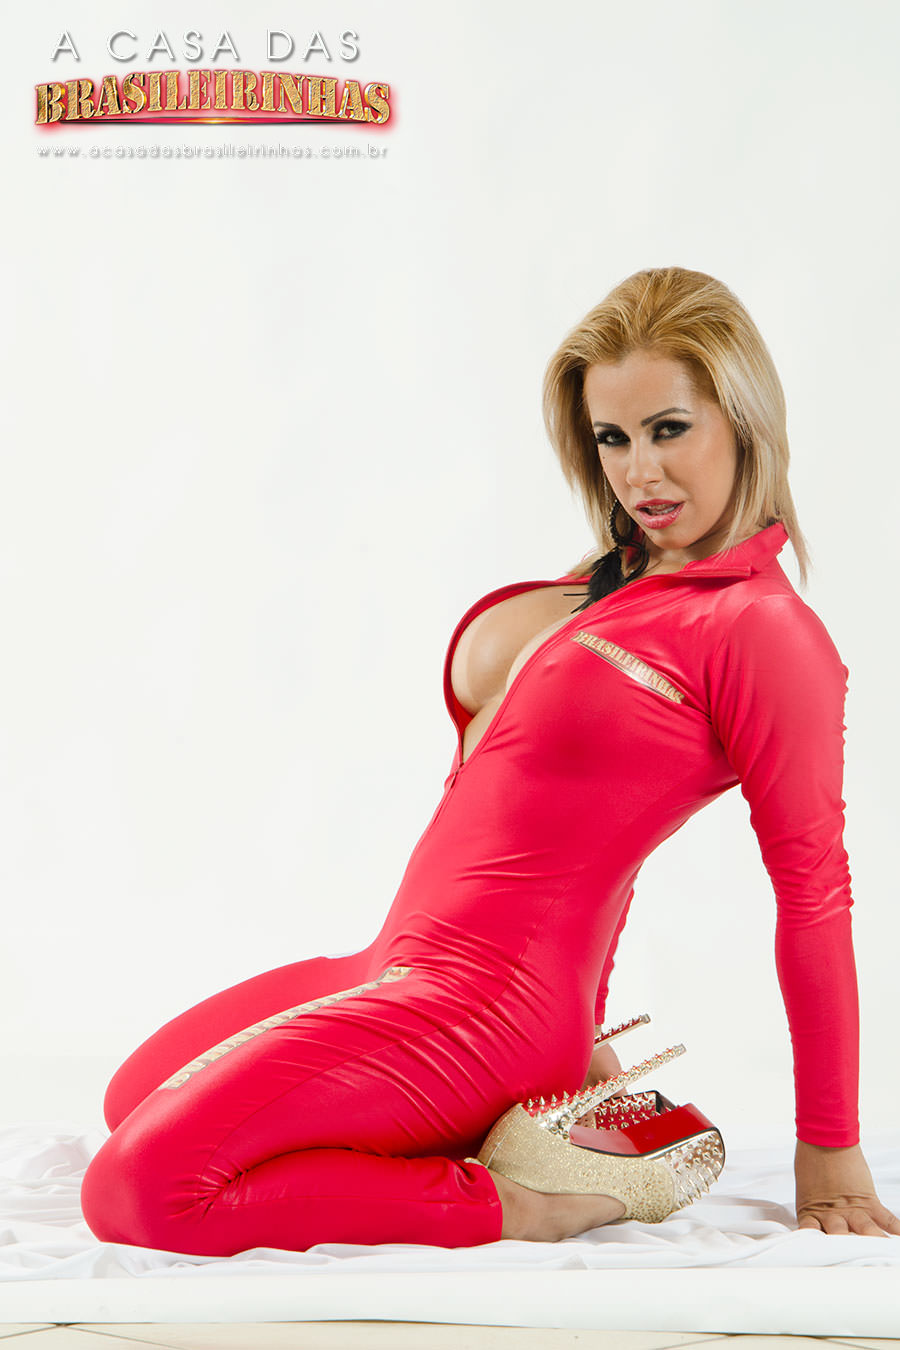 Nicolle-Bittencourt-muito-gostosa-de-joelhos-no-chao.jpg